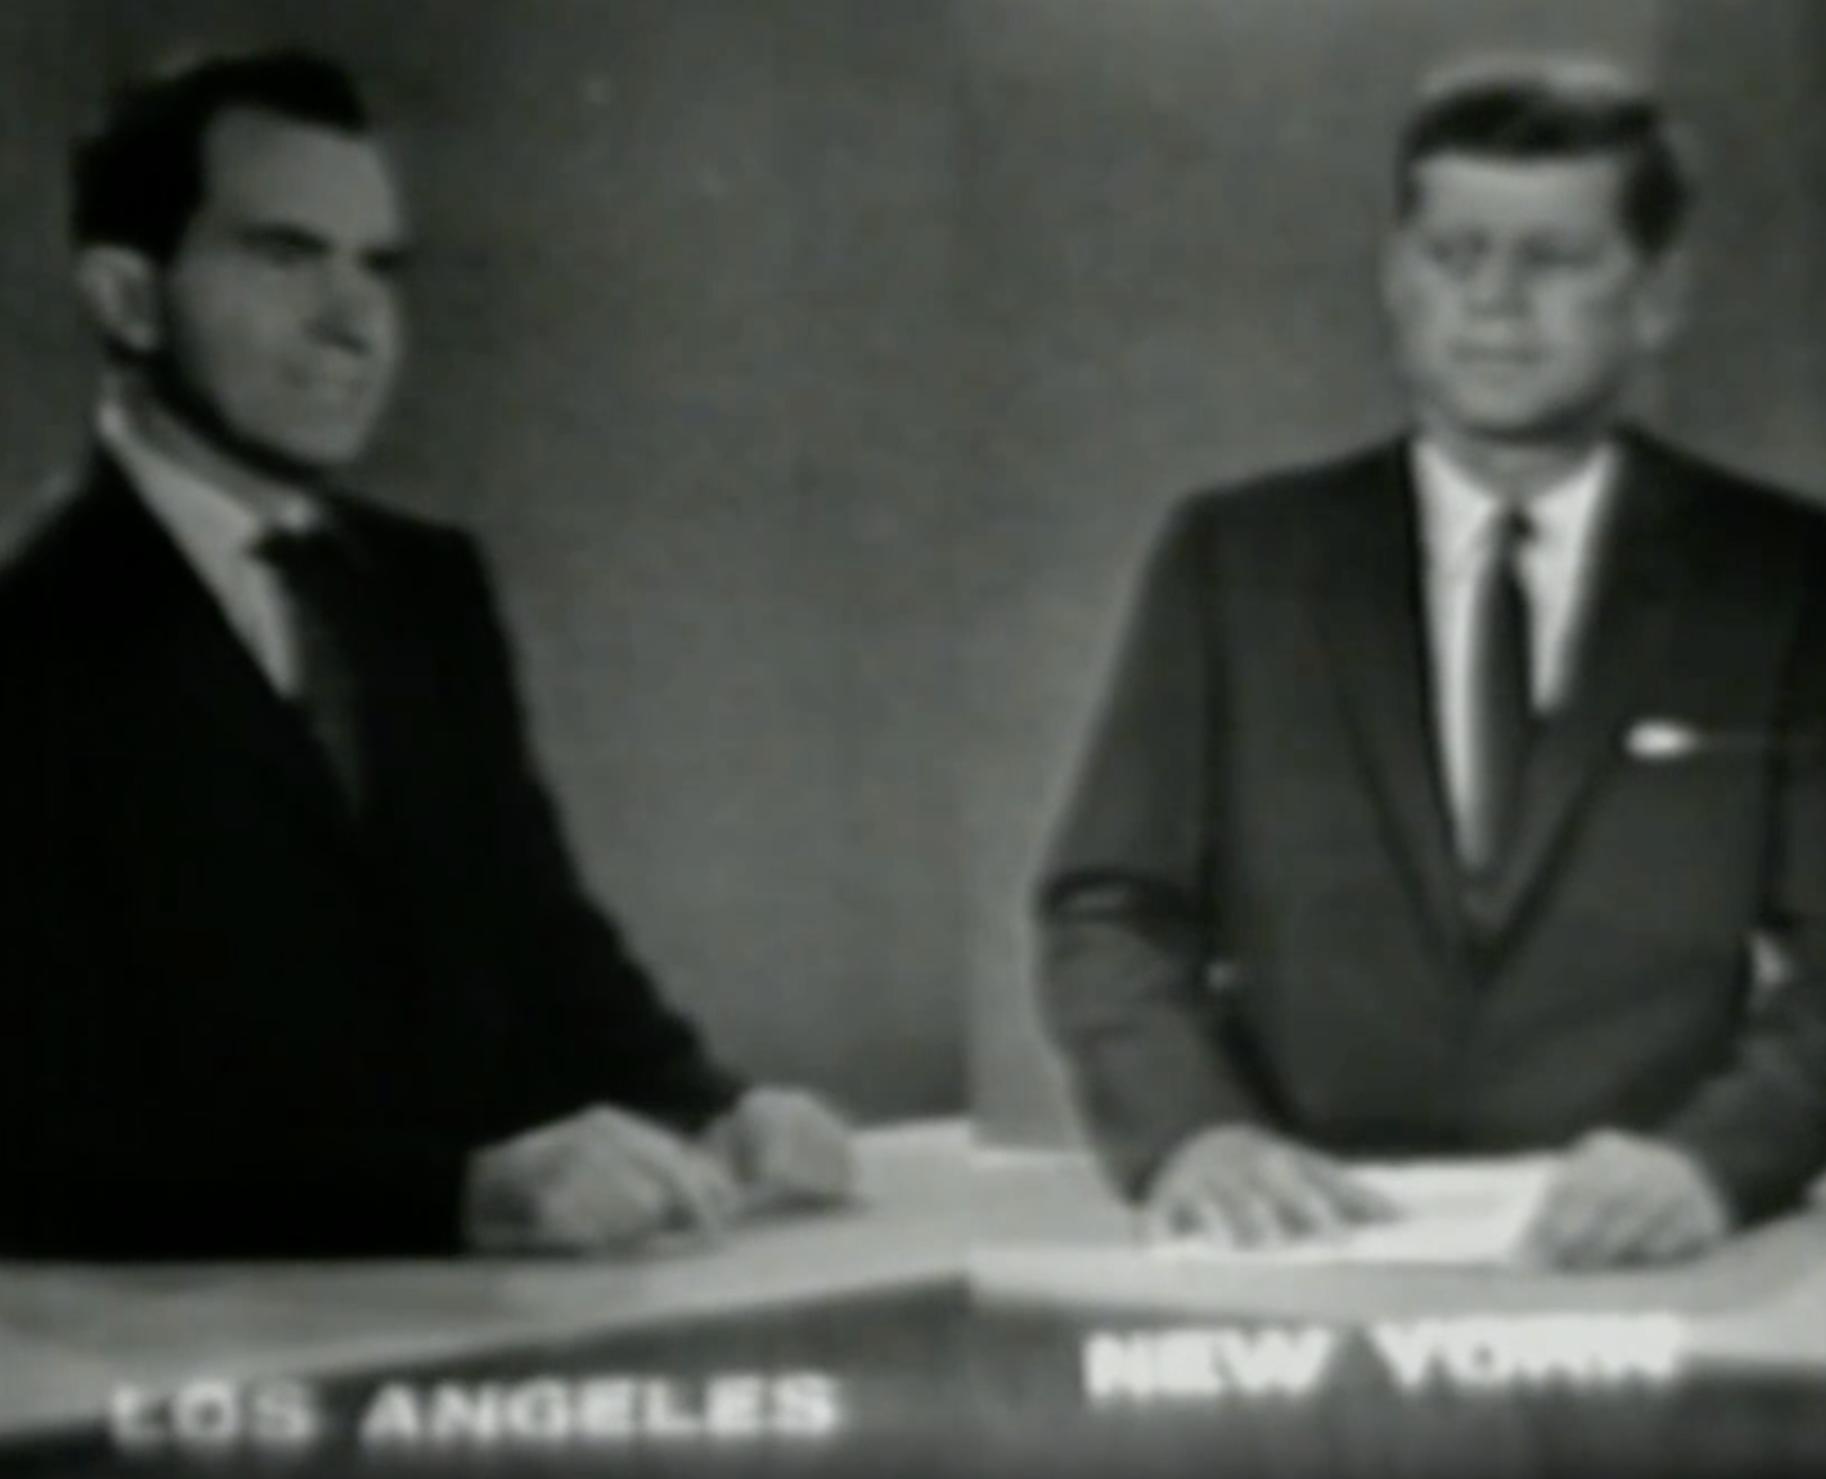 Nixon Kennedy Virtual Debate